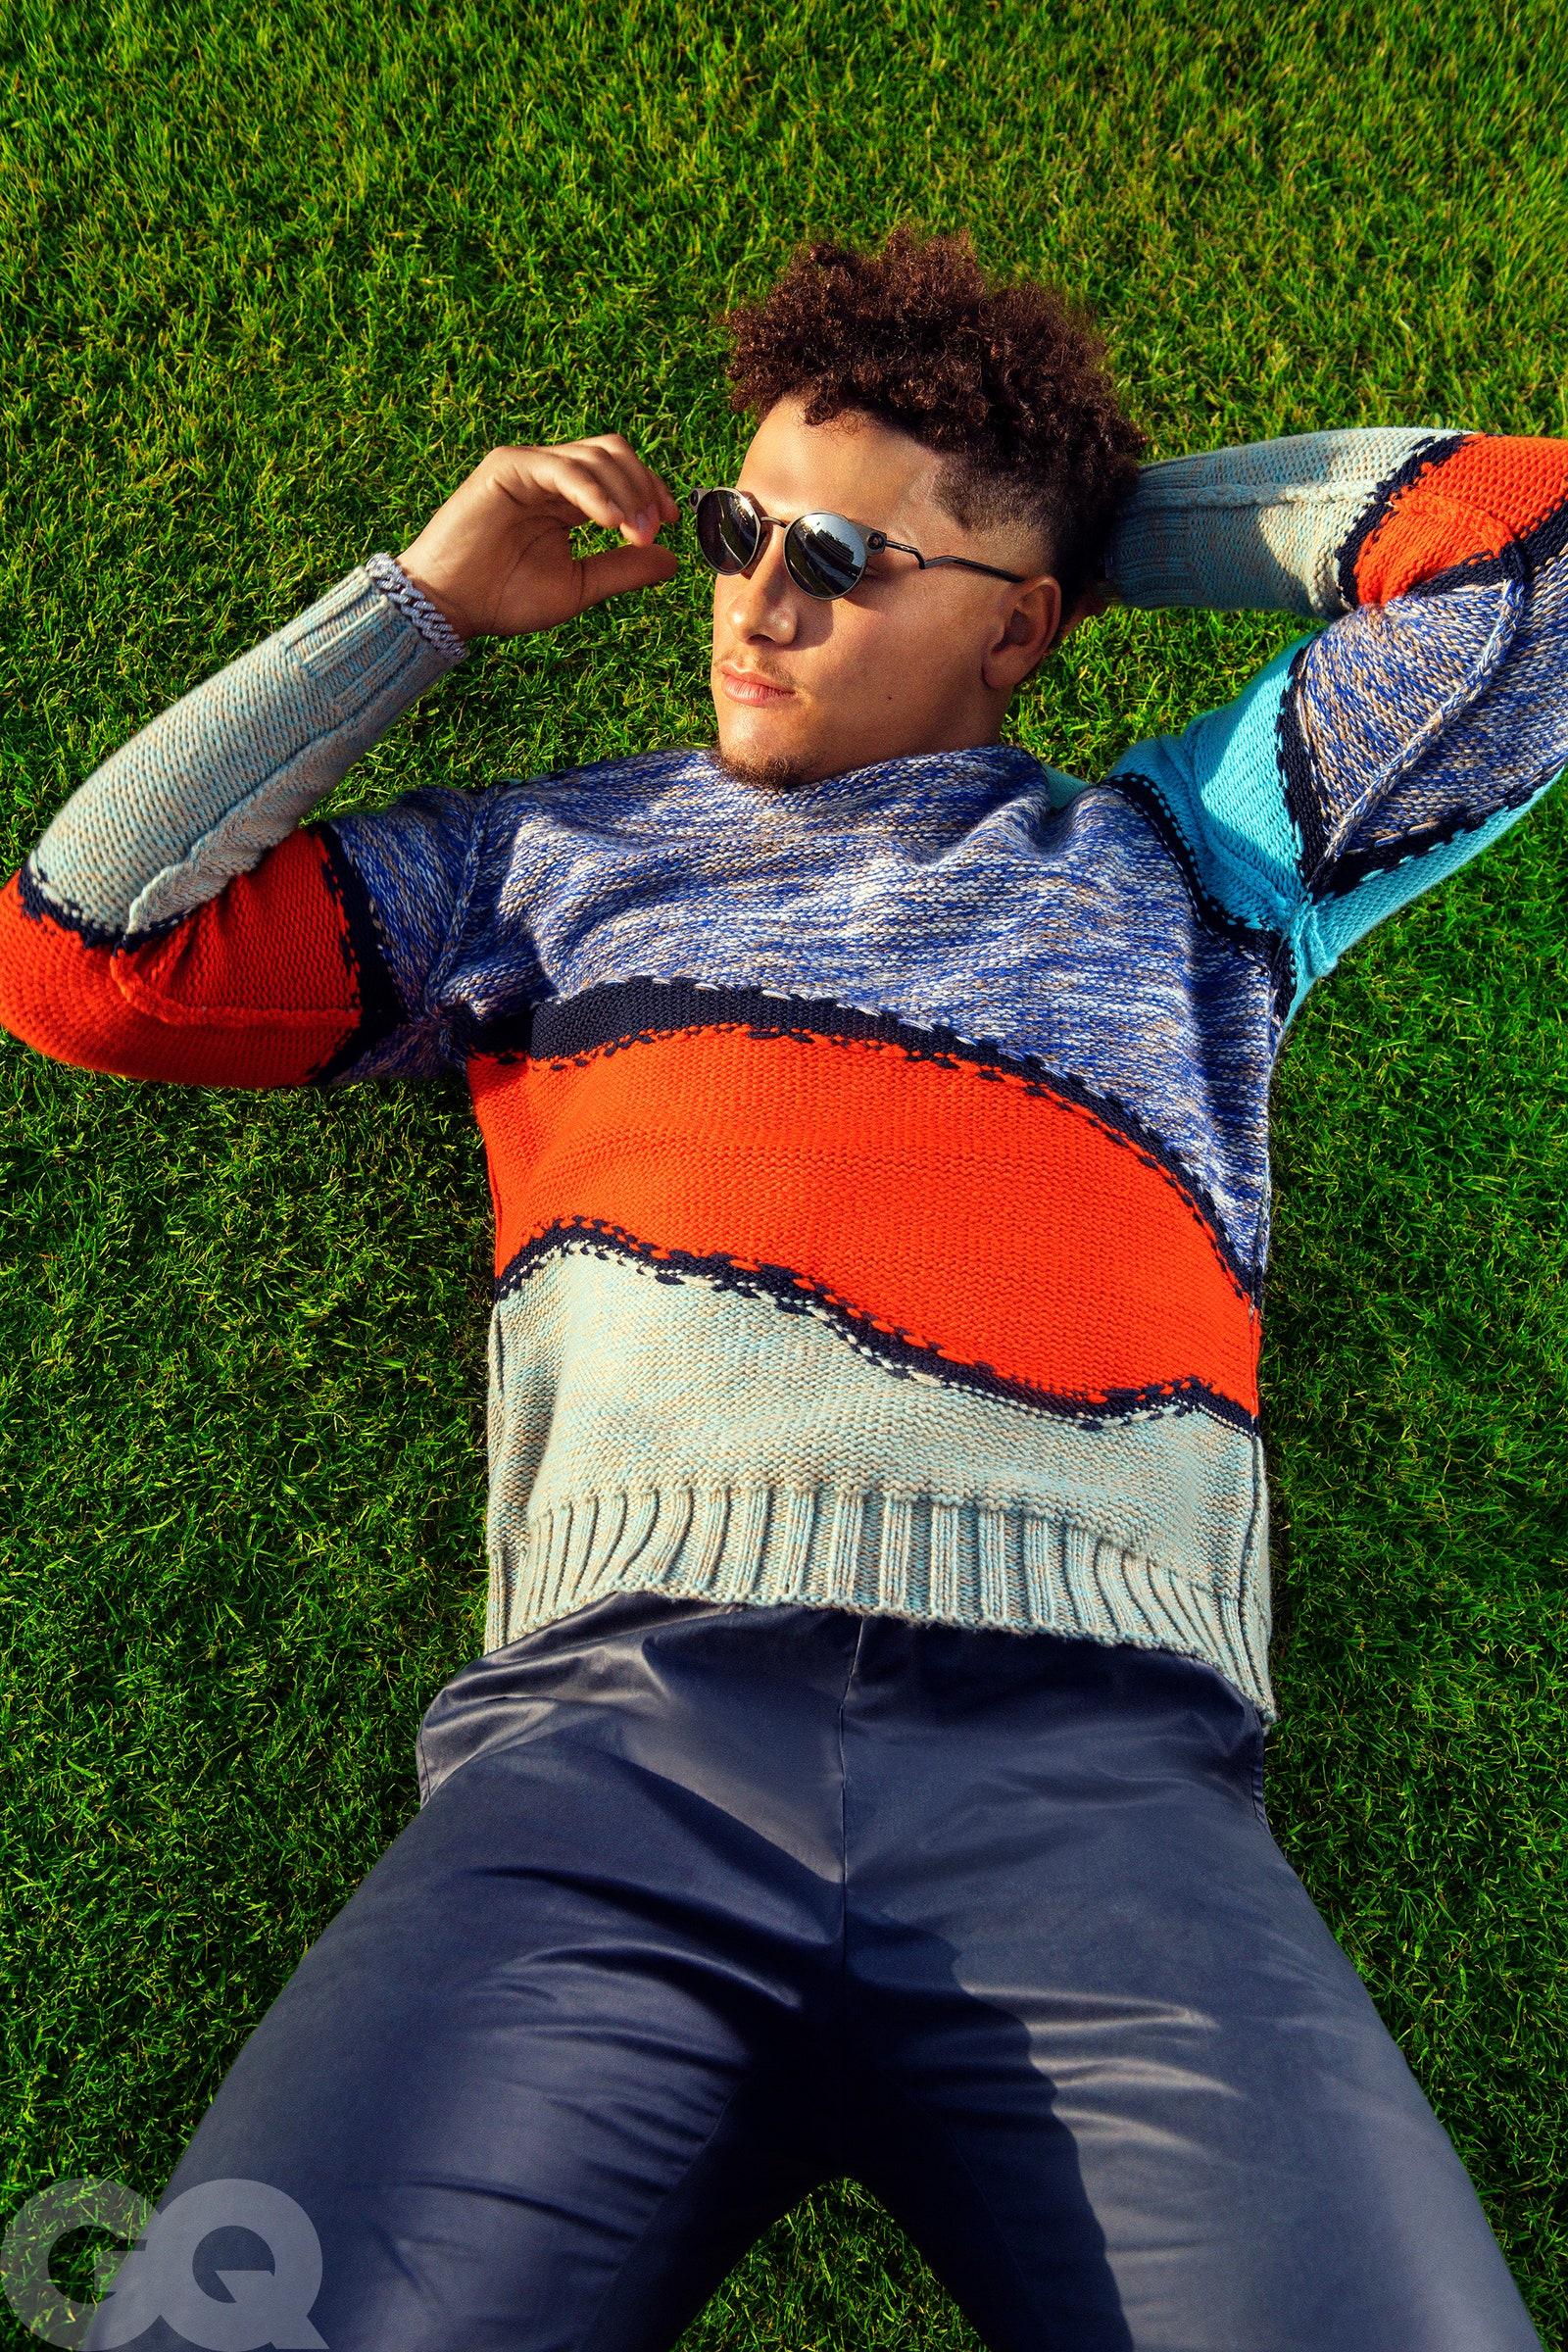 Pari Dukovic Photographs Patrick Mahomes for GQ